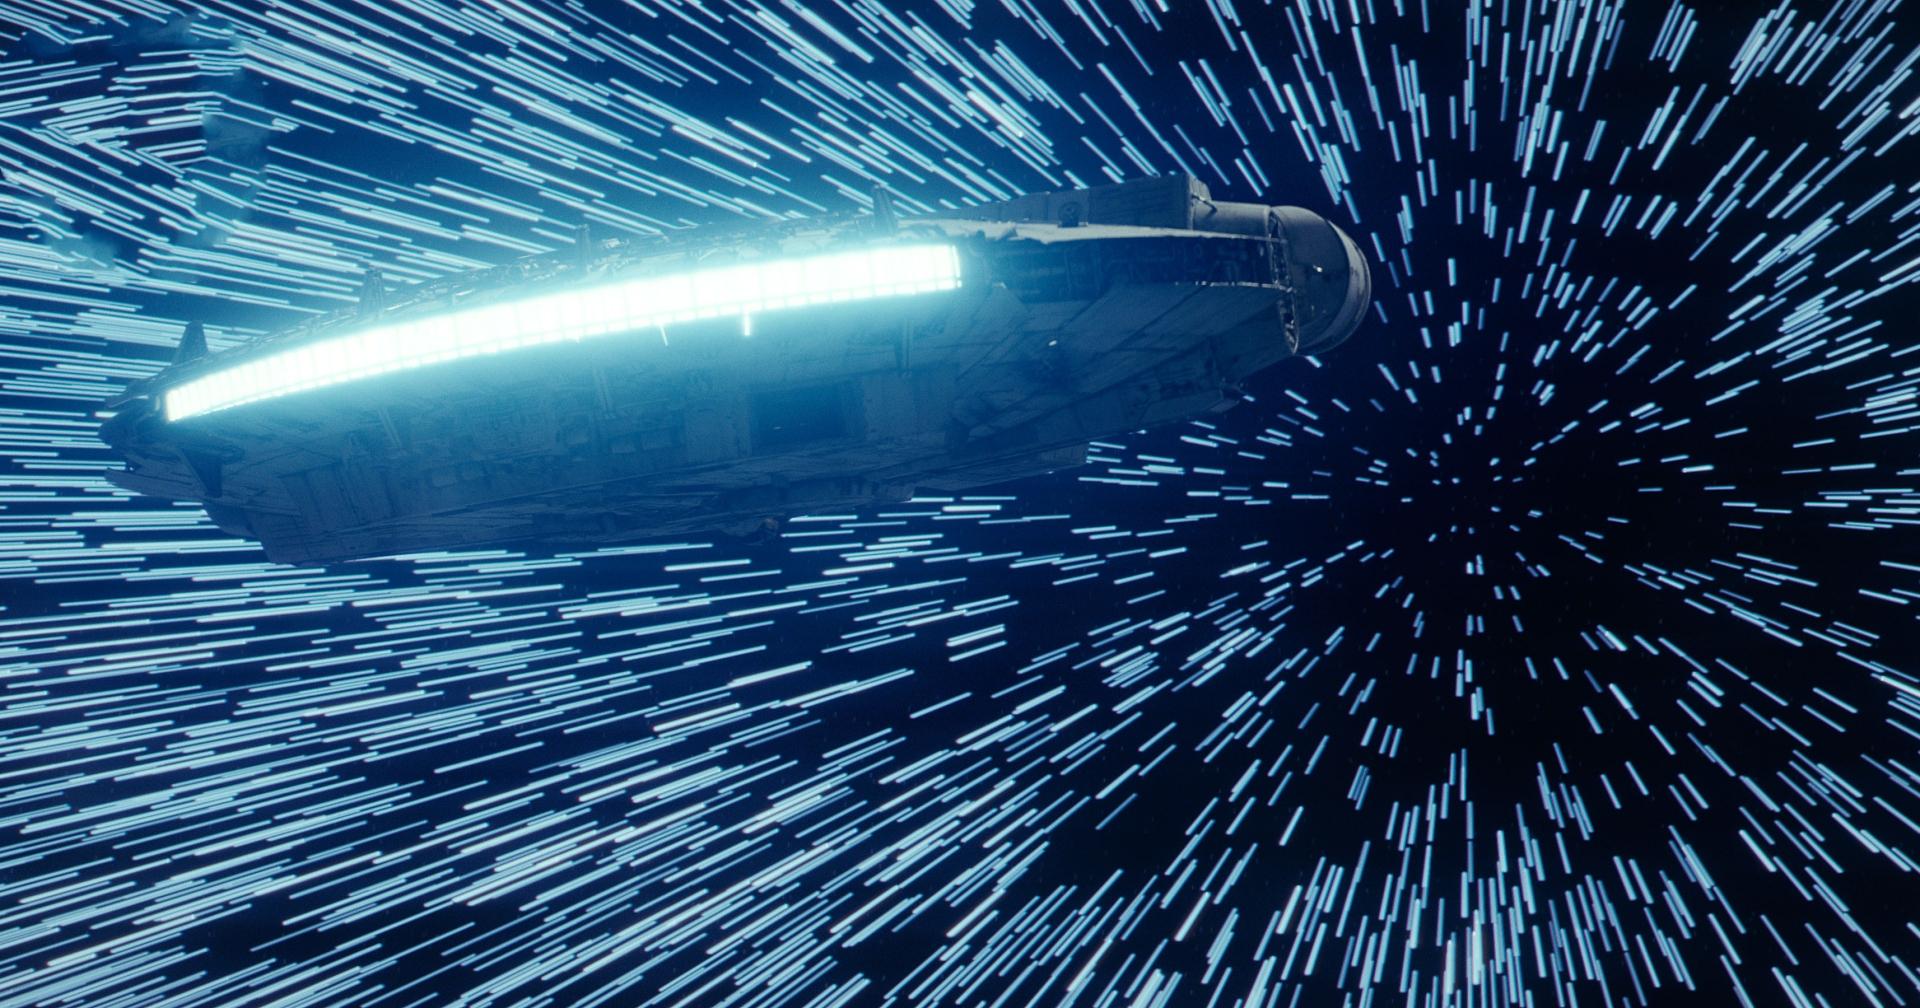 star-wars-the-last-jedi-millennium-falcon-hitting-lightspeed